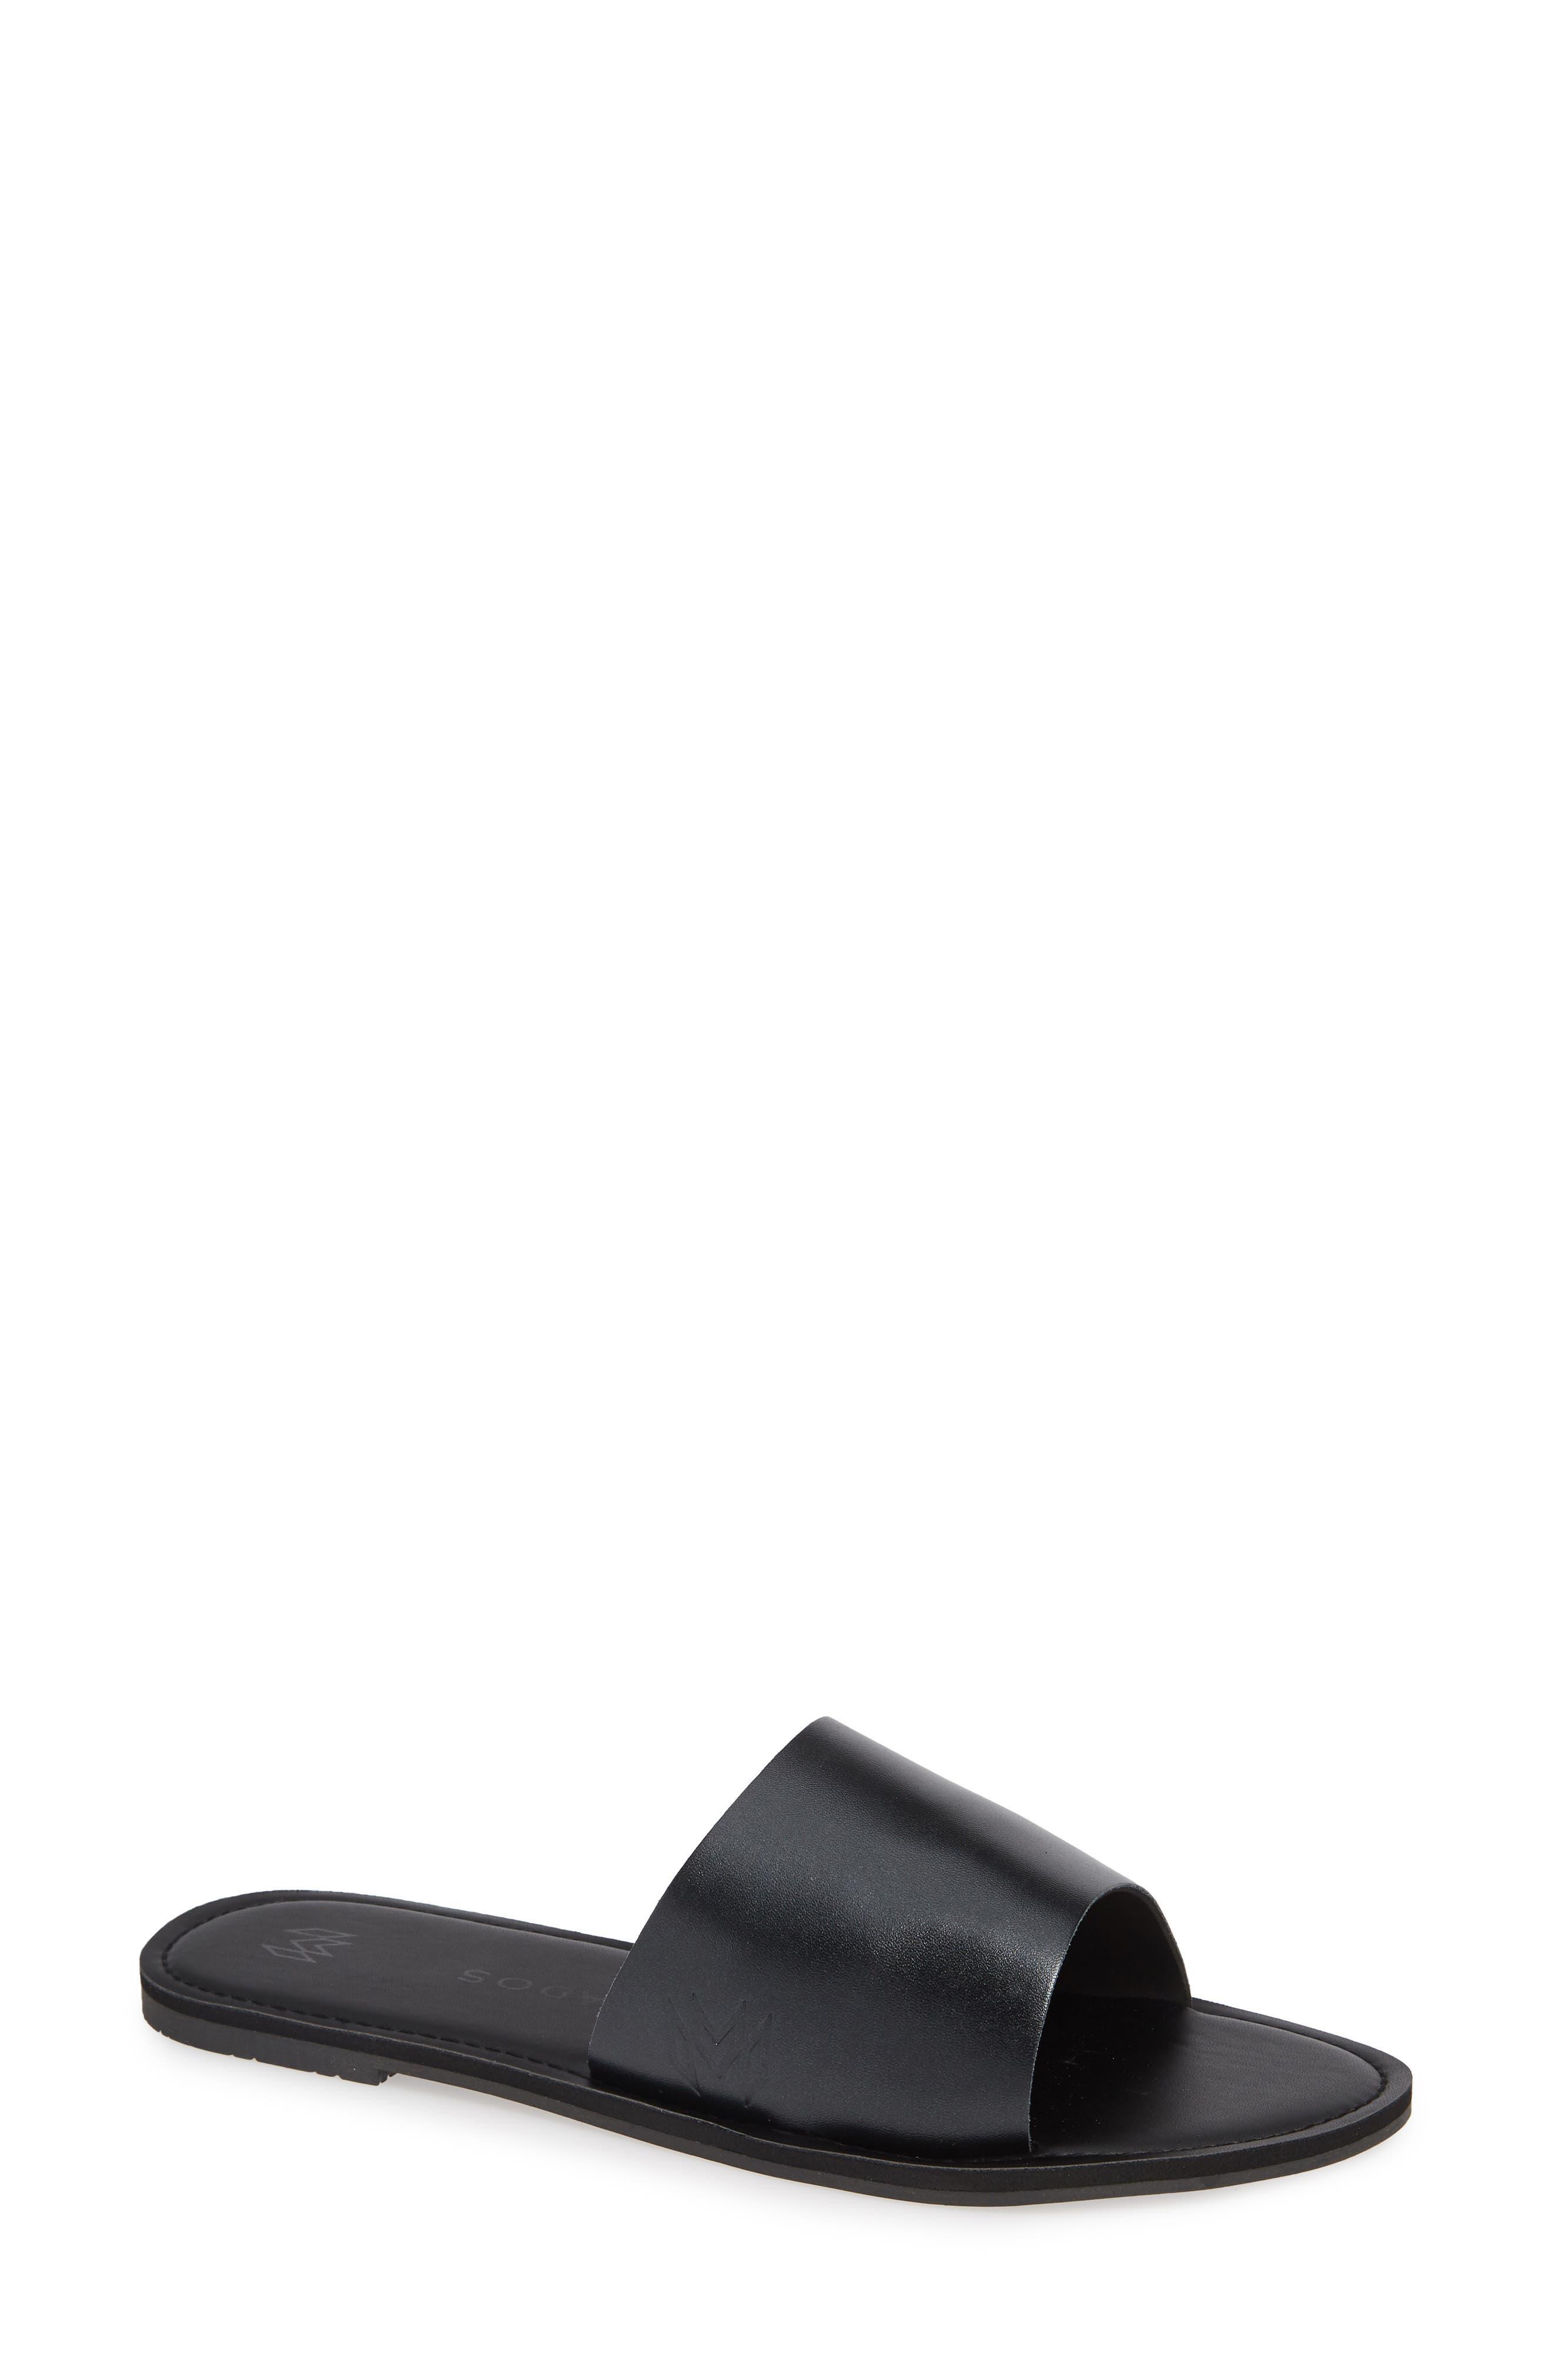 MALVADOS Icon Taylor Noir Slide Sandal, Main, color, LIQUORISH